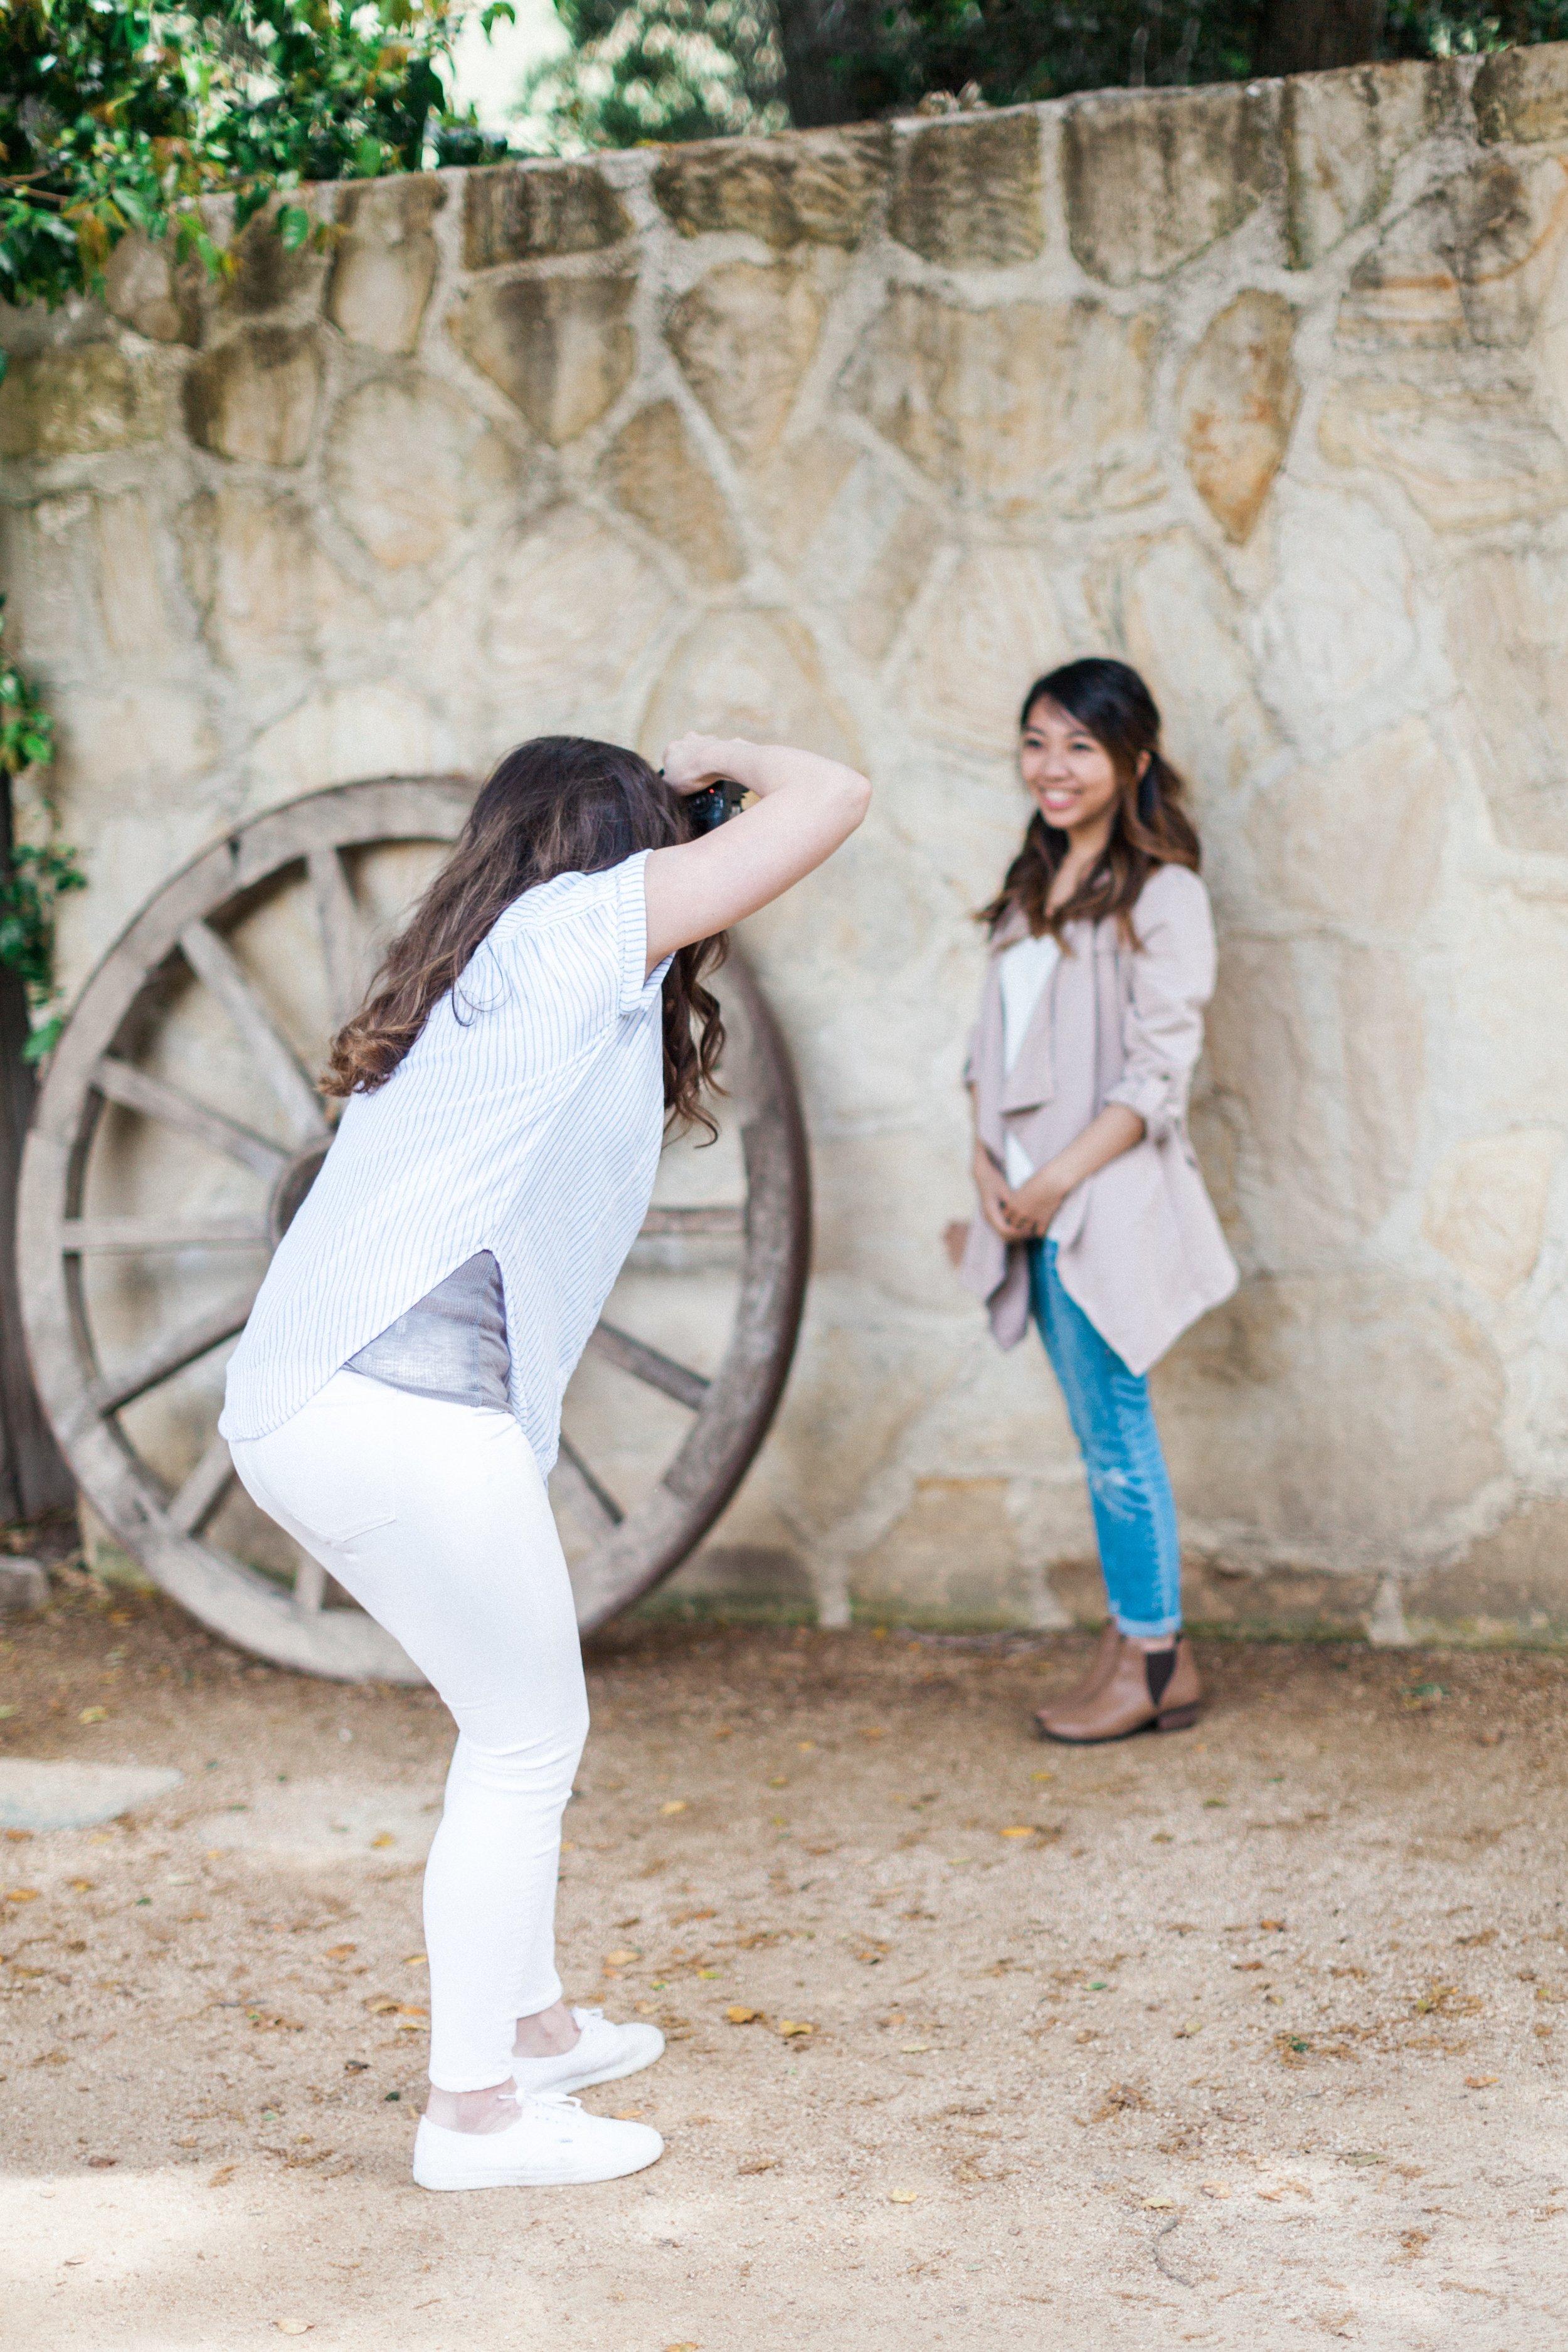 Ragi-and-Amanda-Bloom-Workshop-Carmel-215.jpg